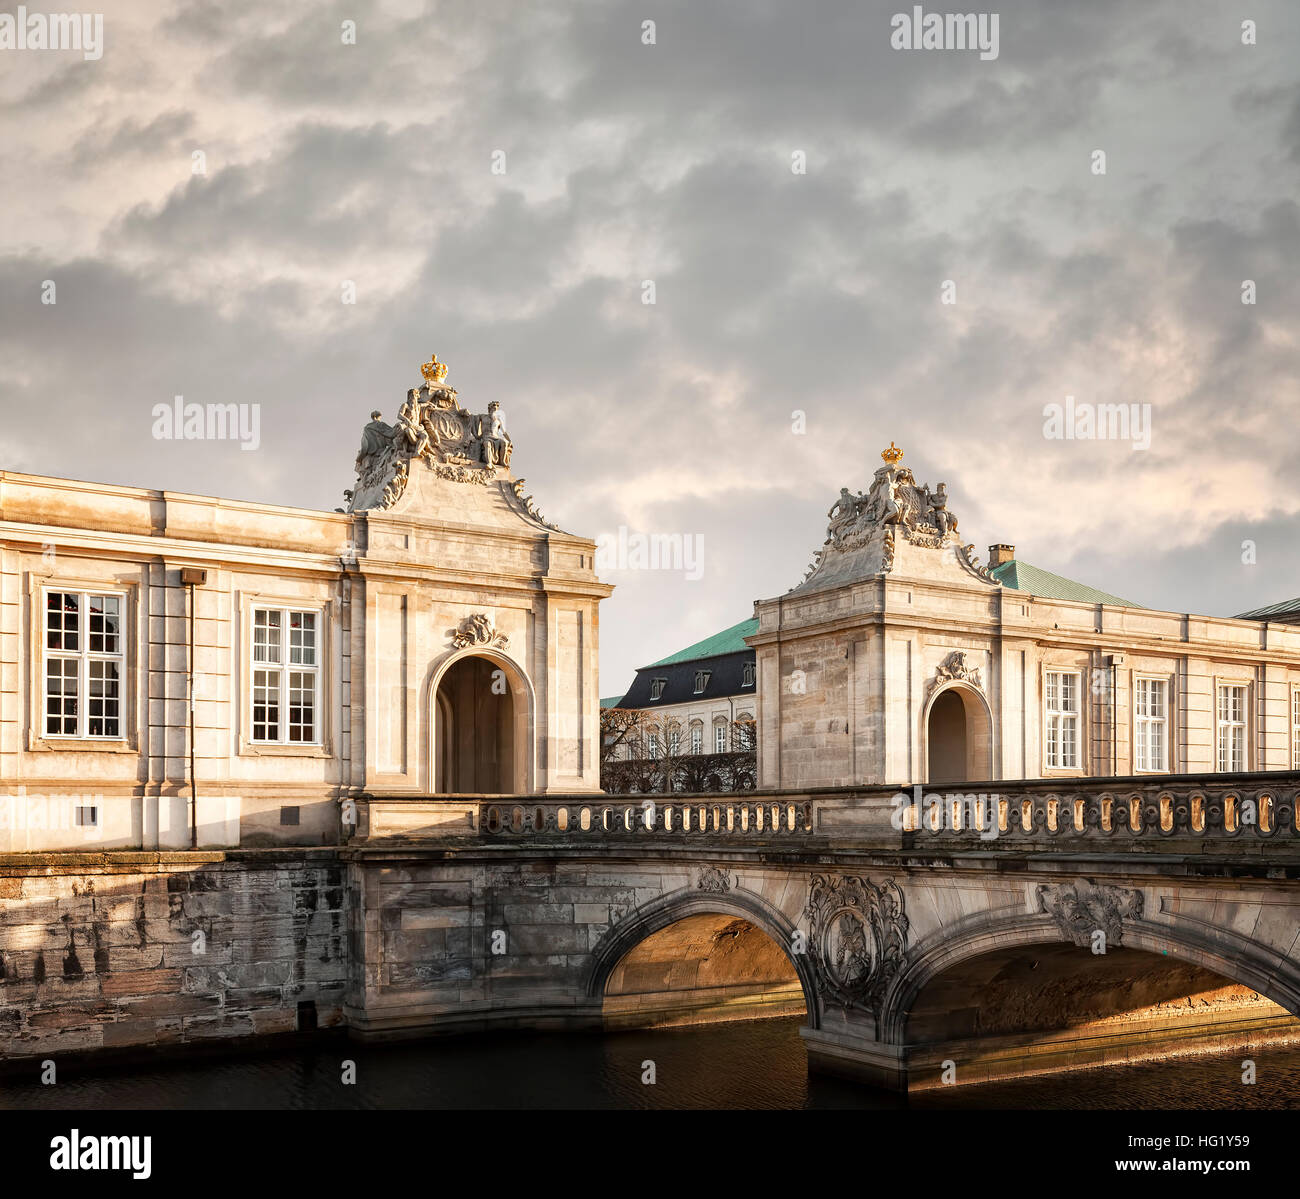 Image of the grand entrance to the castle of Christiansborg in Copenhagen, Denmark. - Stock Image